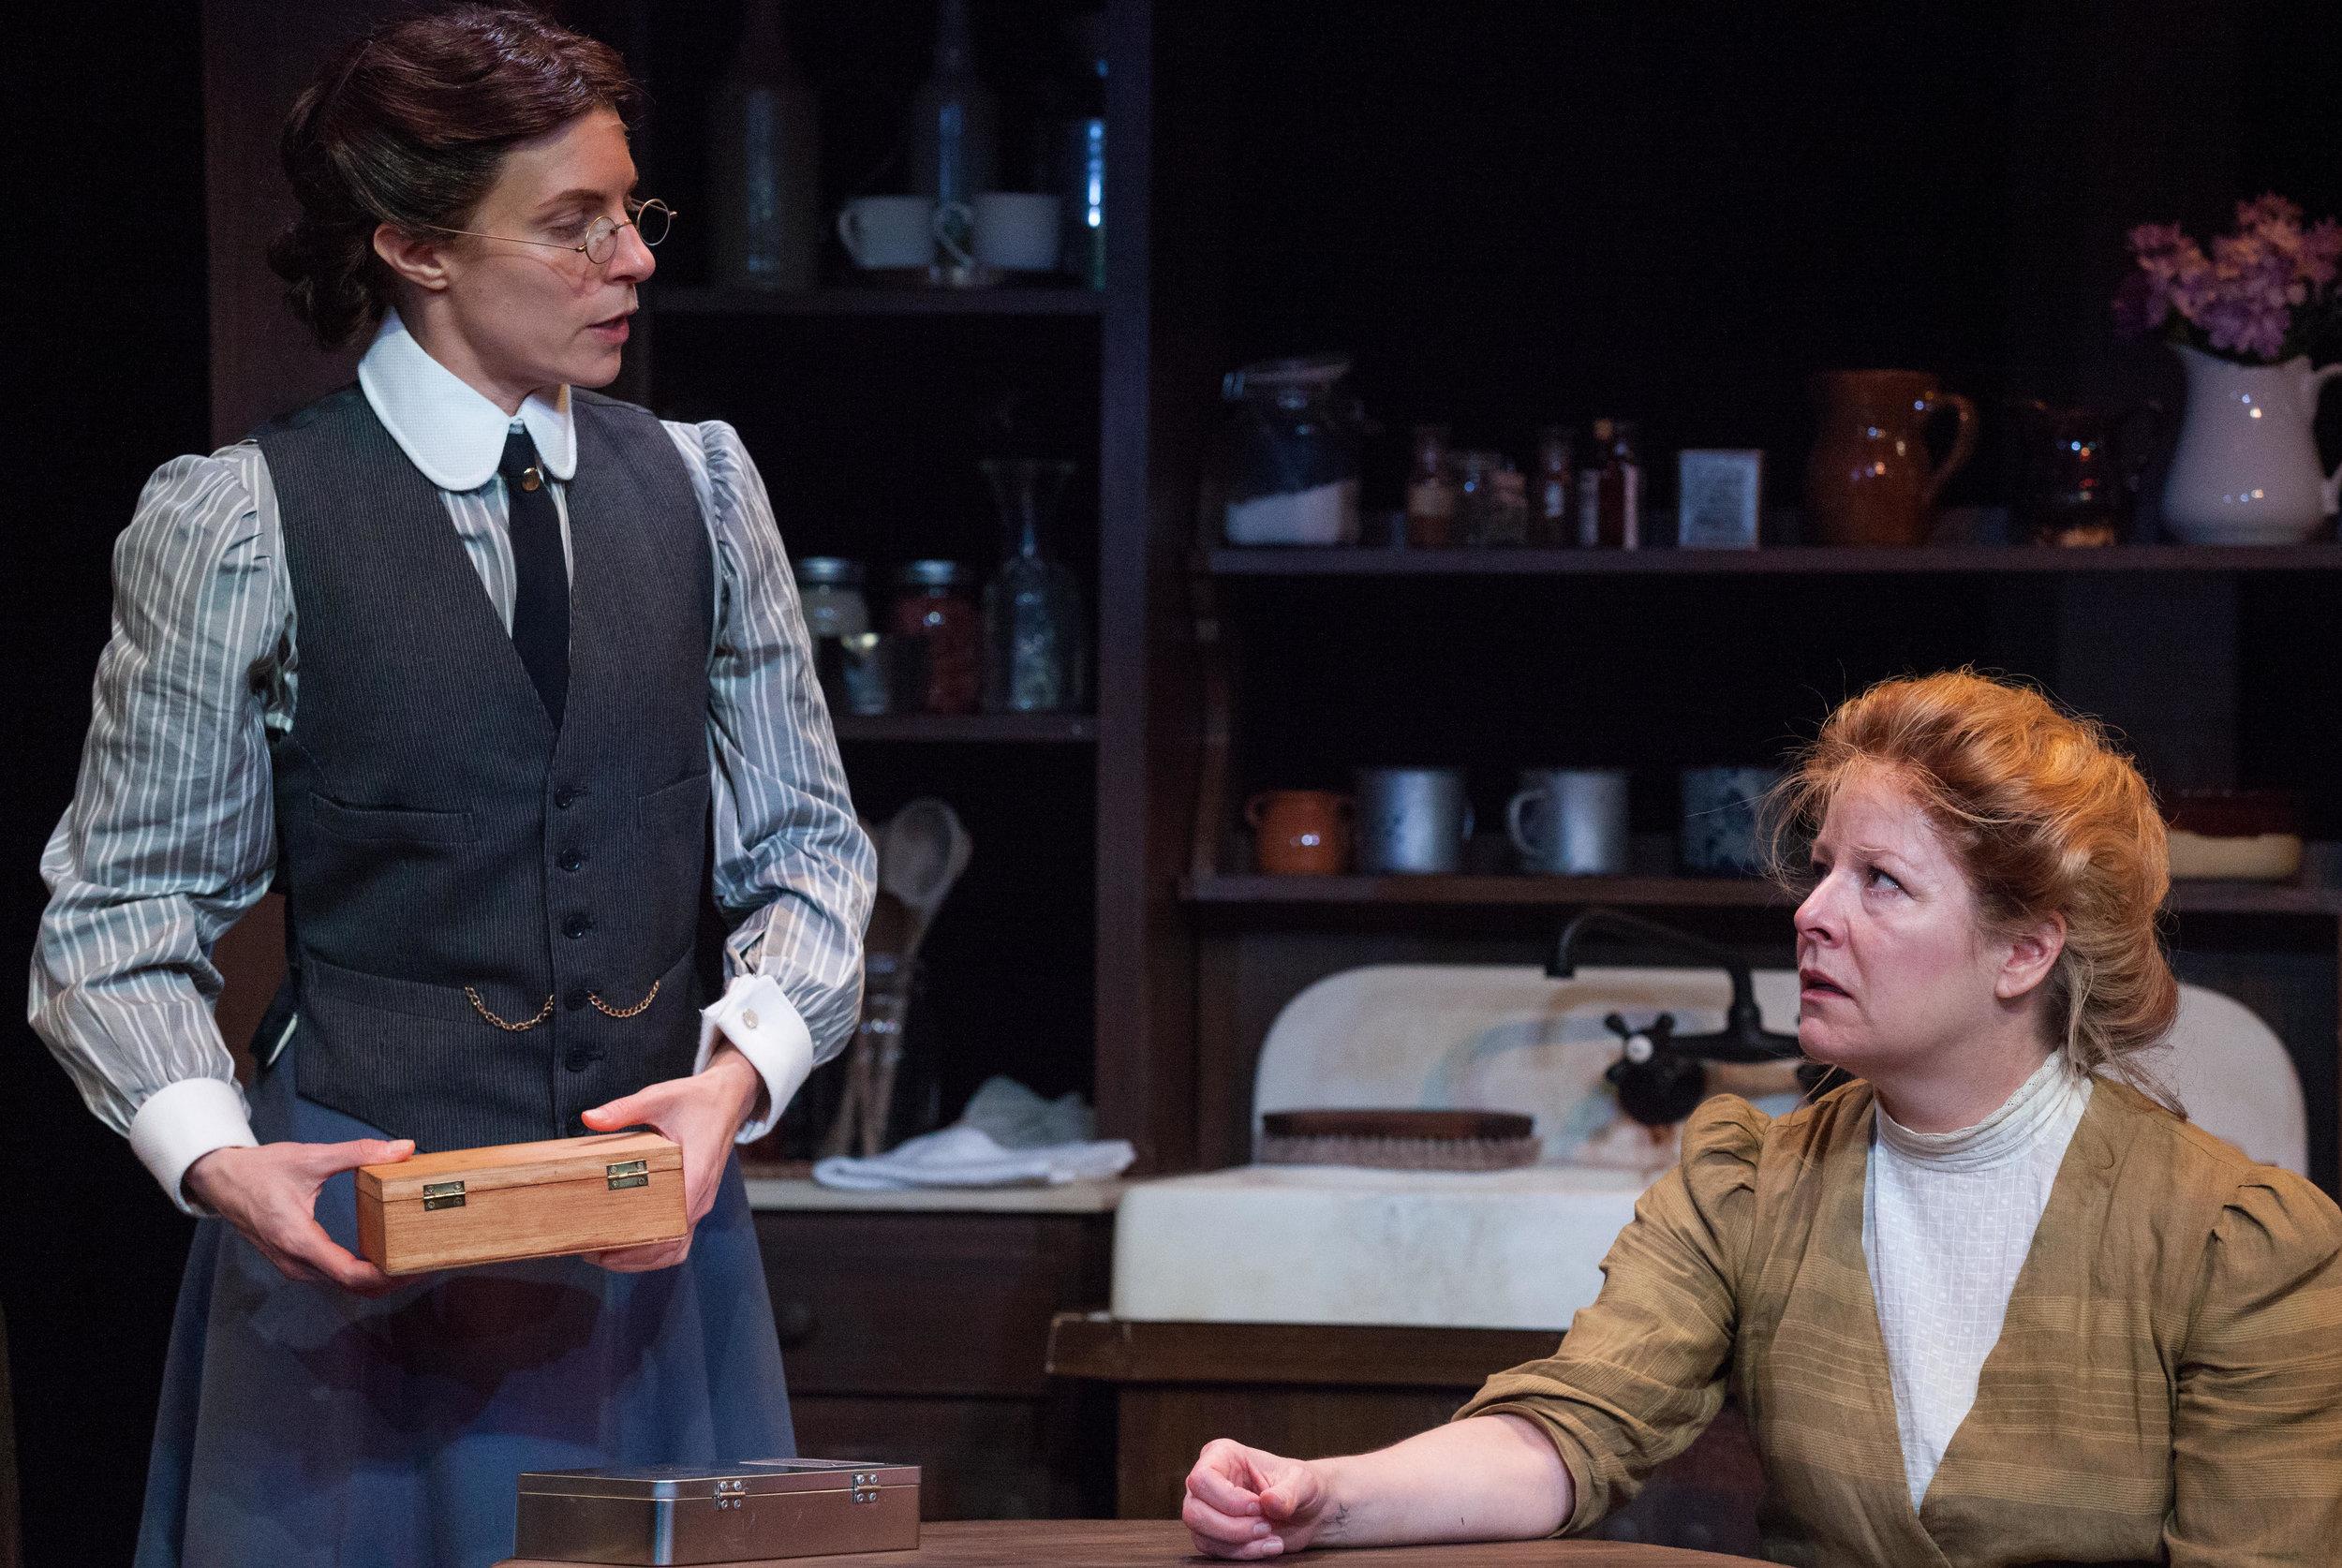 Keri as Dr. Ann Saltzer and Tasha Lawrence as Mary Mallon. Photo by Carolyn Brown.